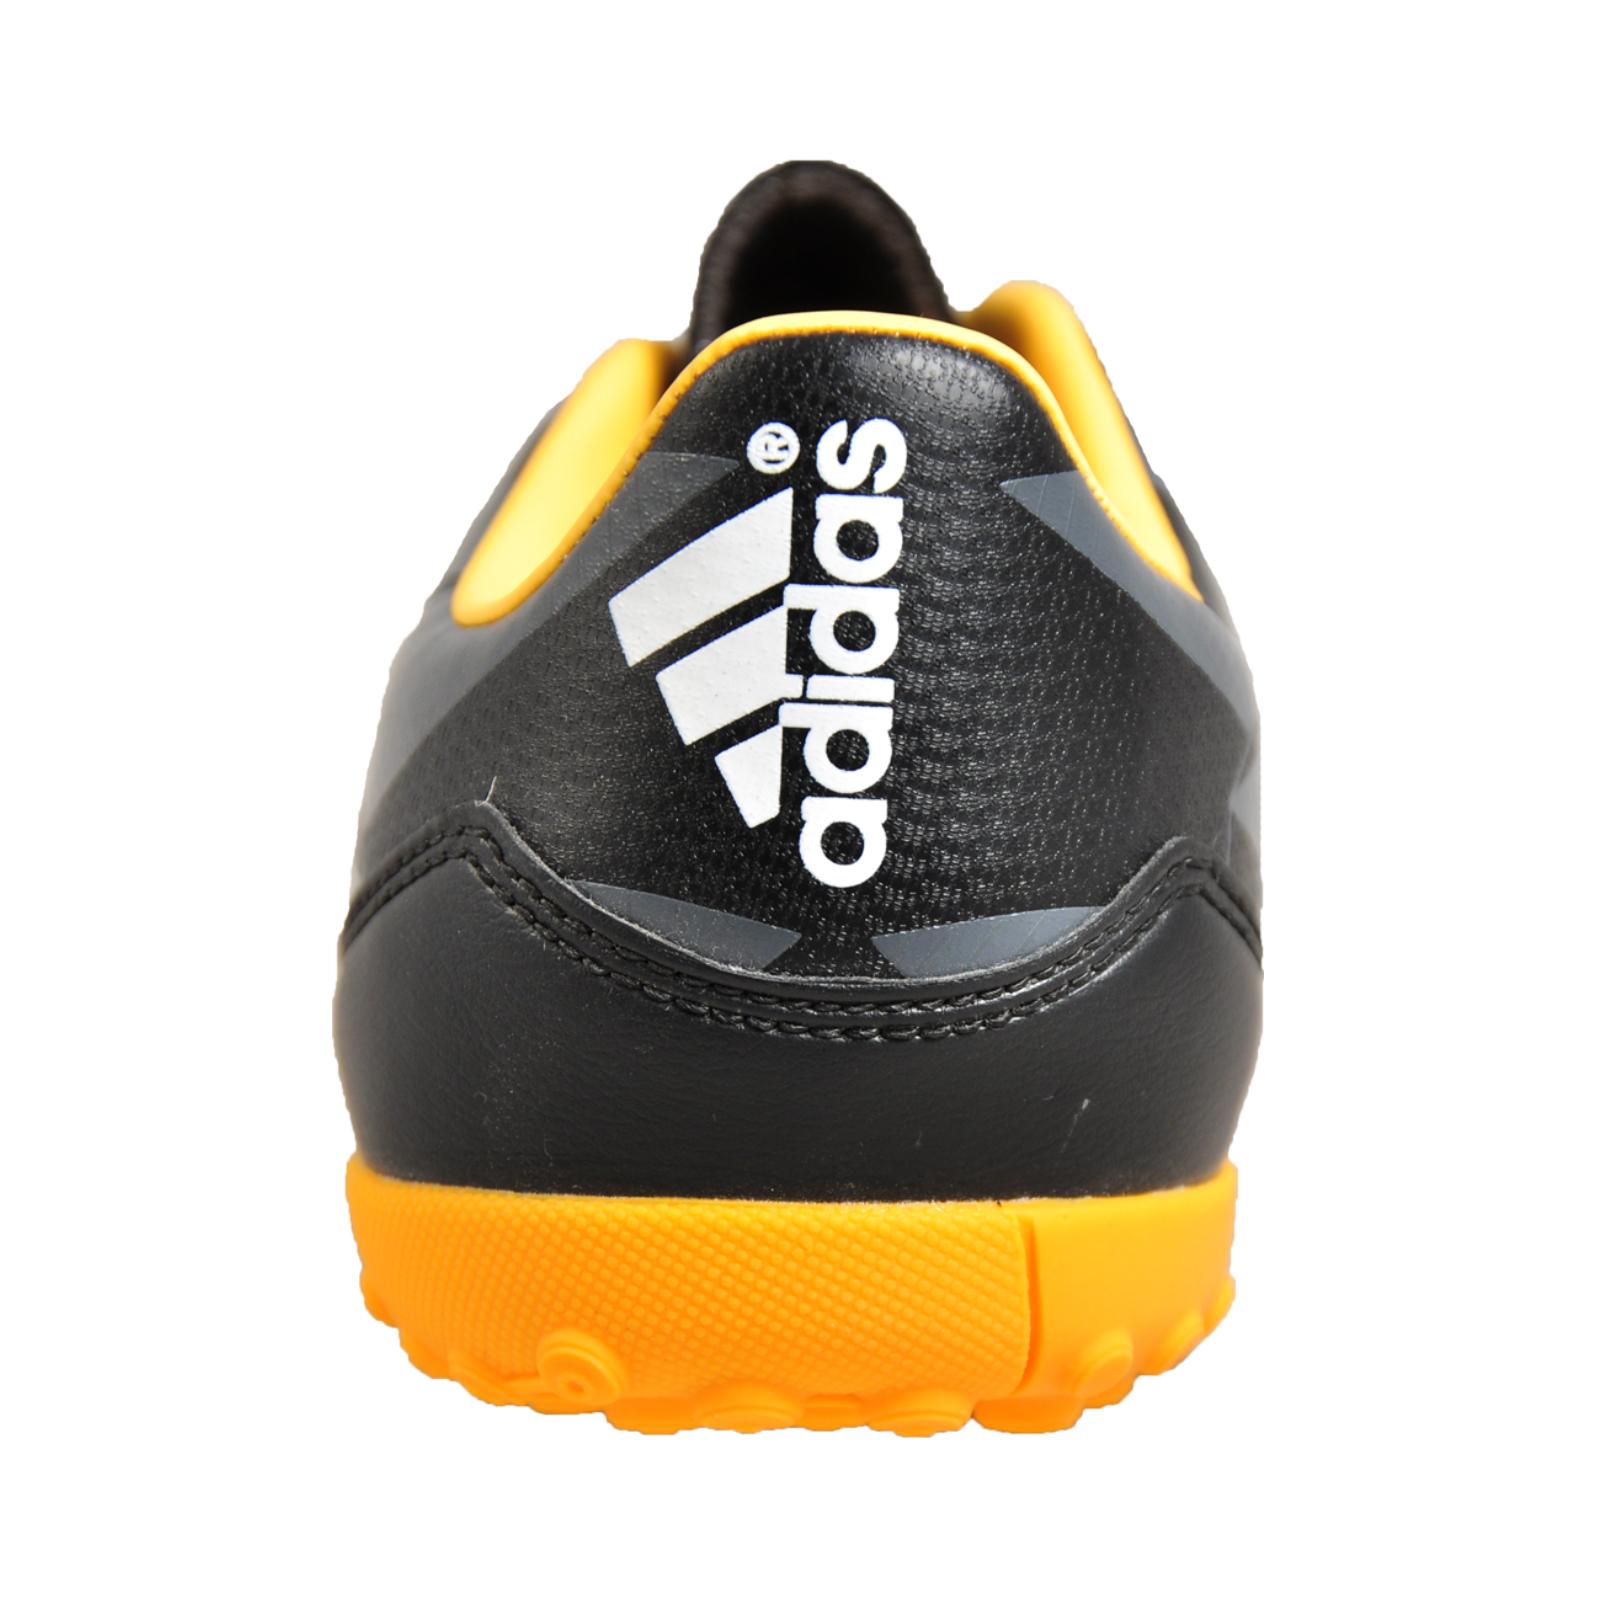 Adidas F10 TF Turf Junior Football Soccer Trainers Black